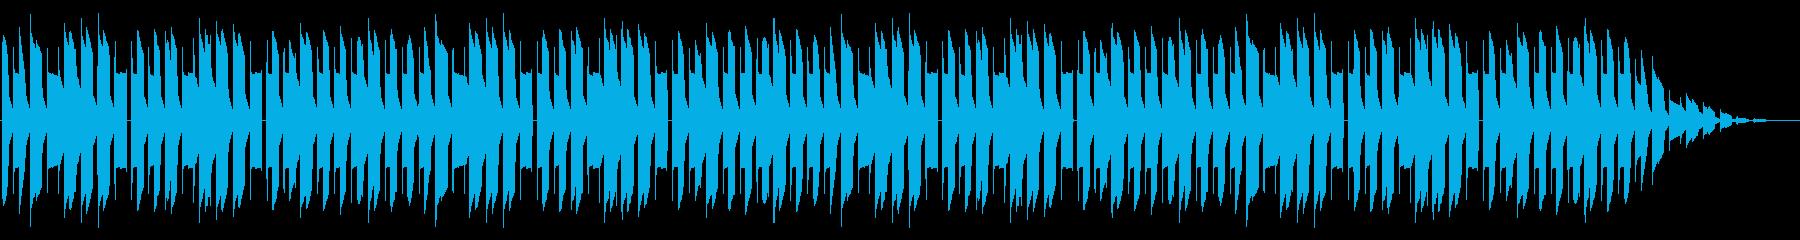 NES アクションB03-1(ステージ3の再生済みの波形